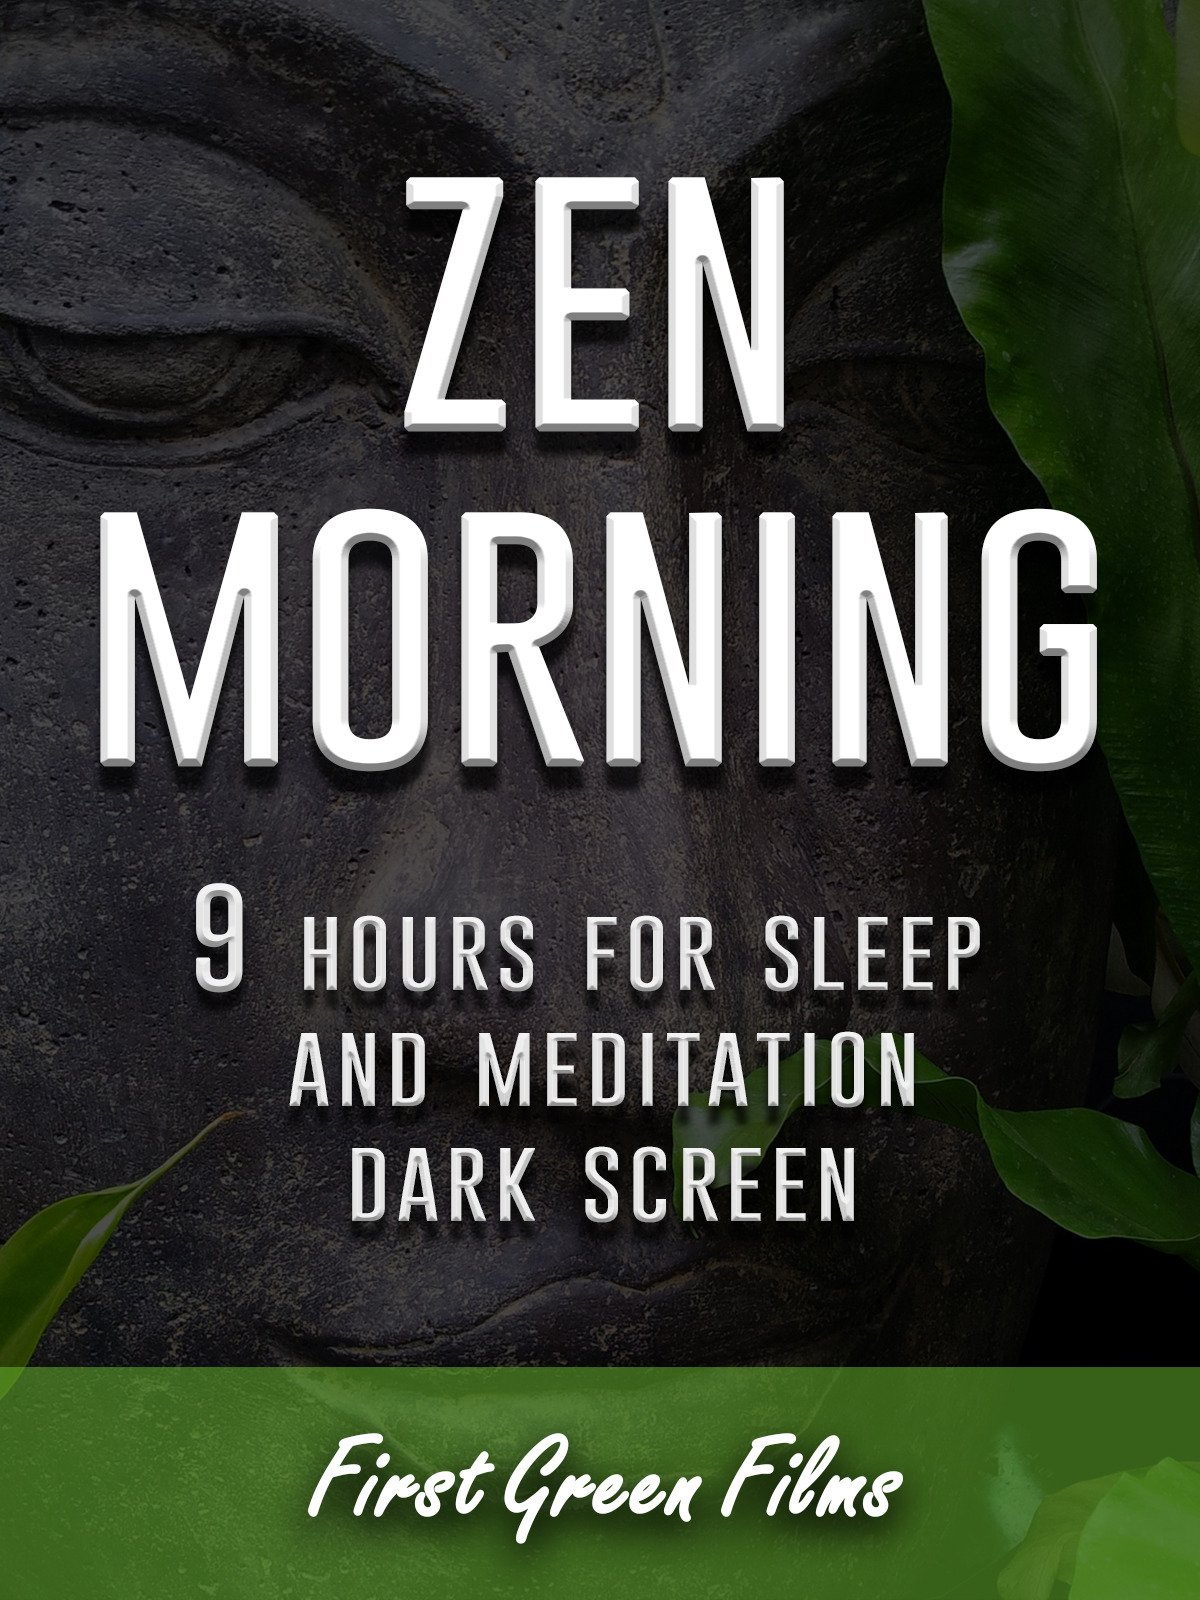 Zen morning, 9 hours for Sleep and Meditation, dark screen